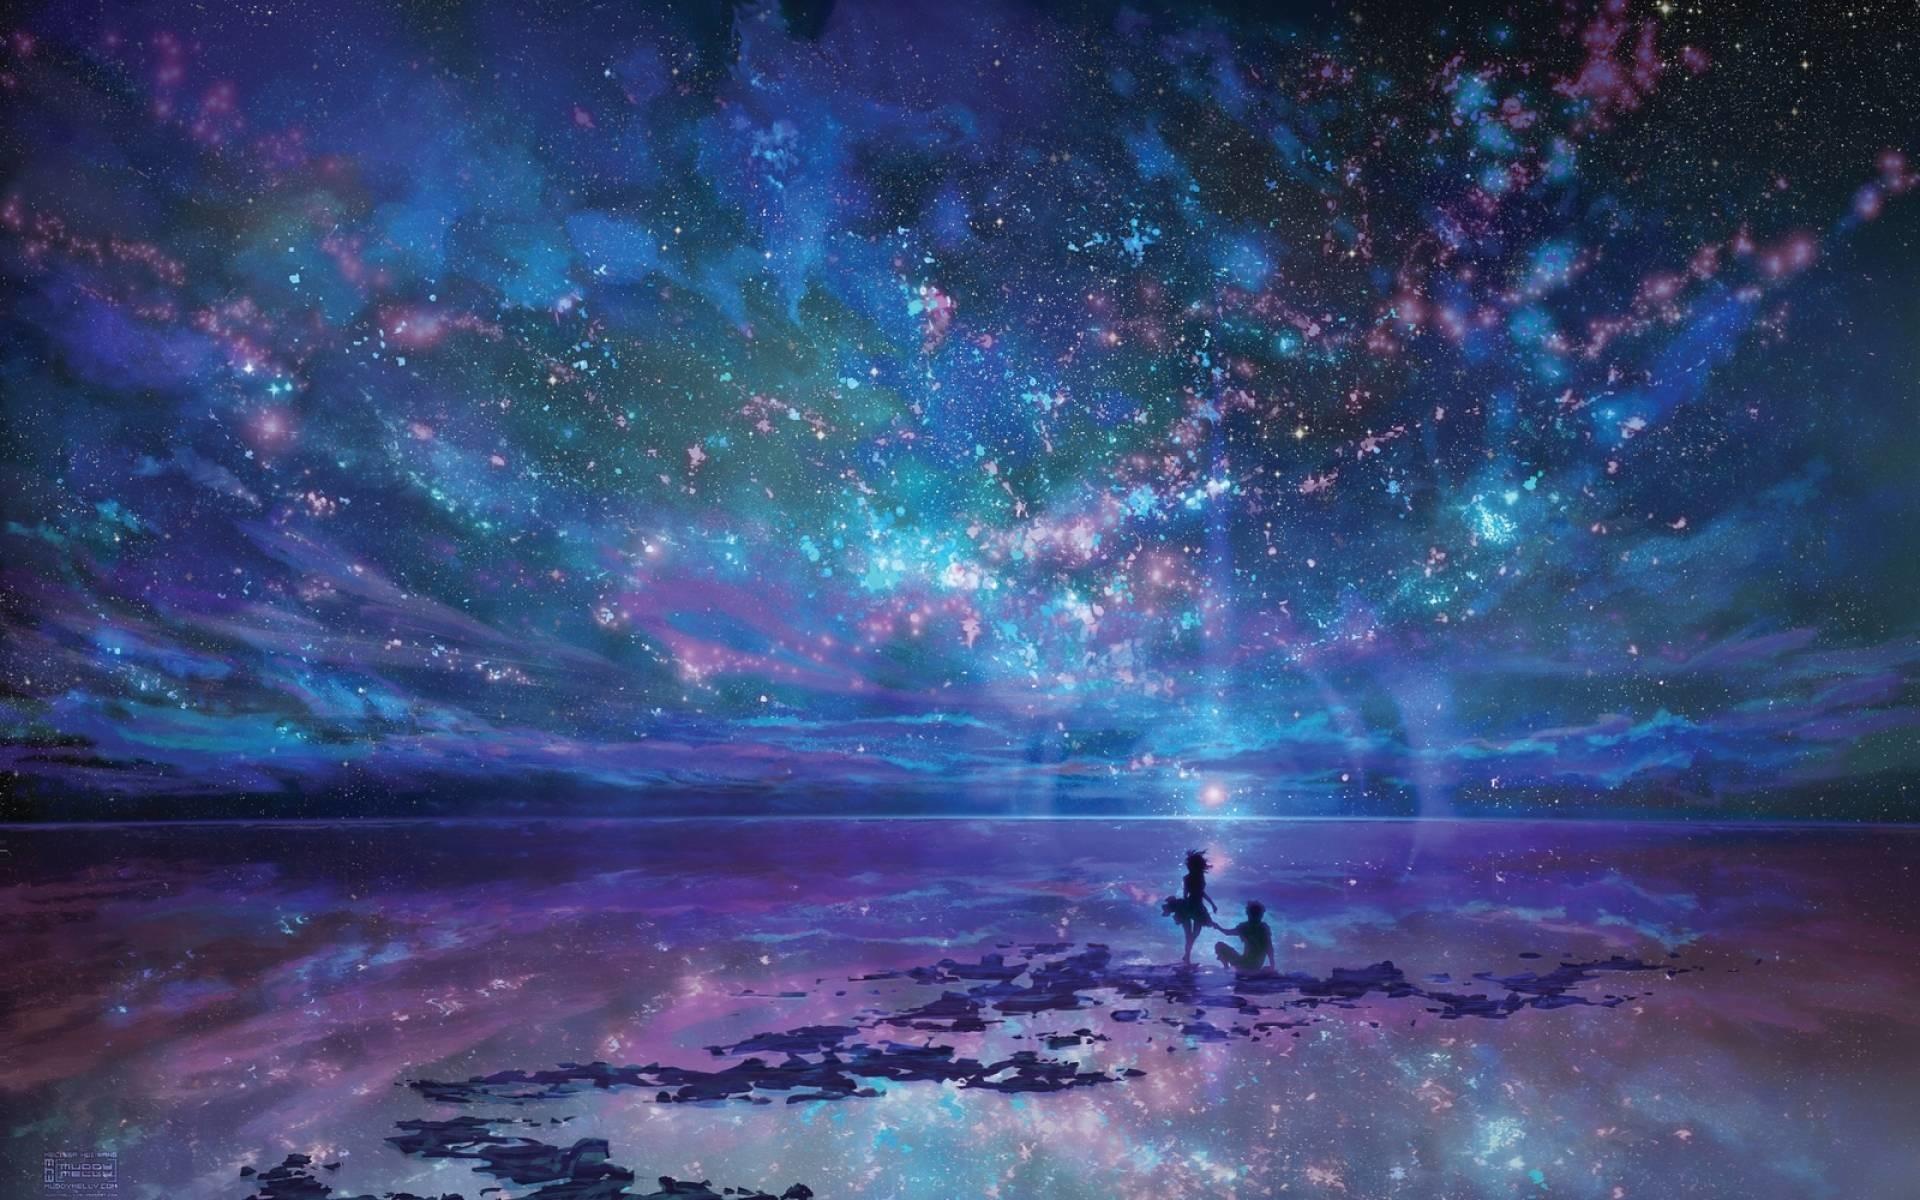 Star Ocean Wallpapers – Full HD wallpaper search